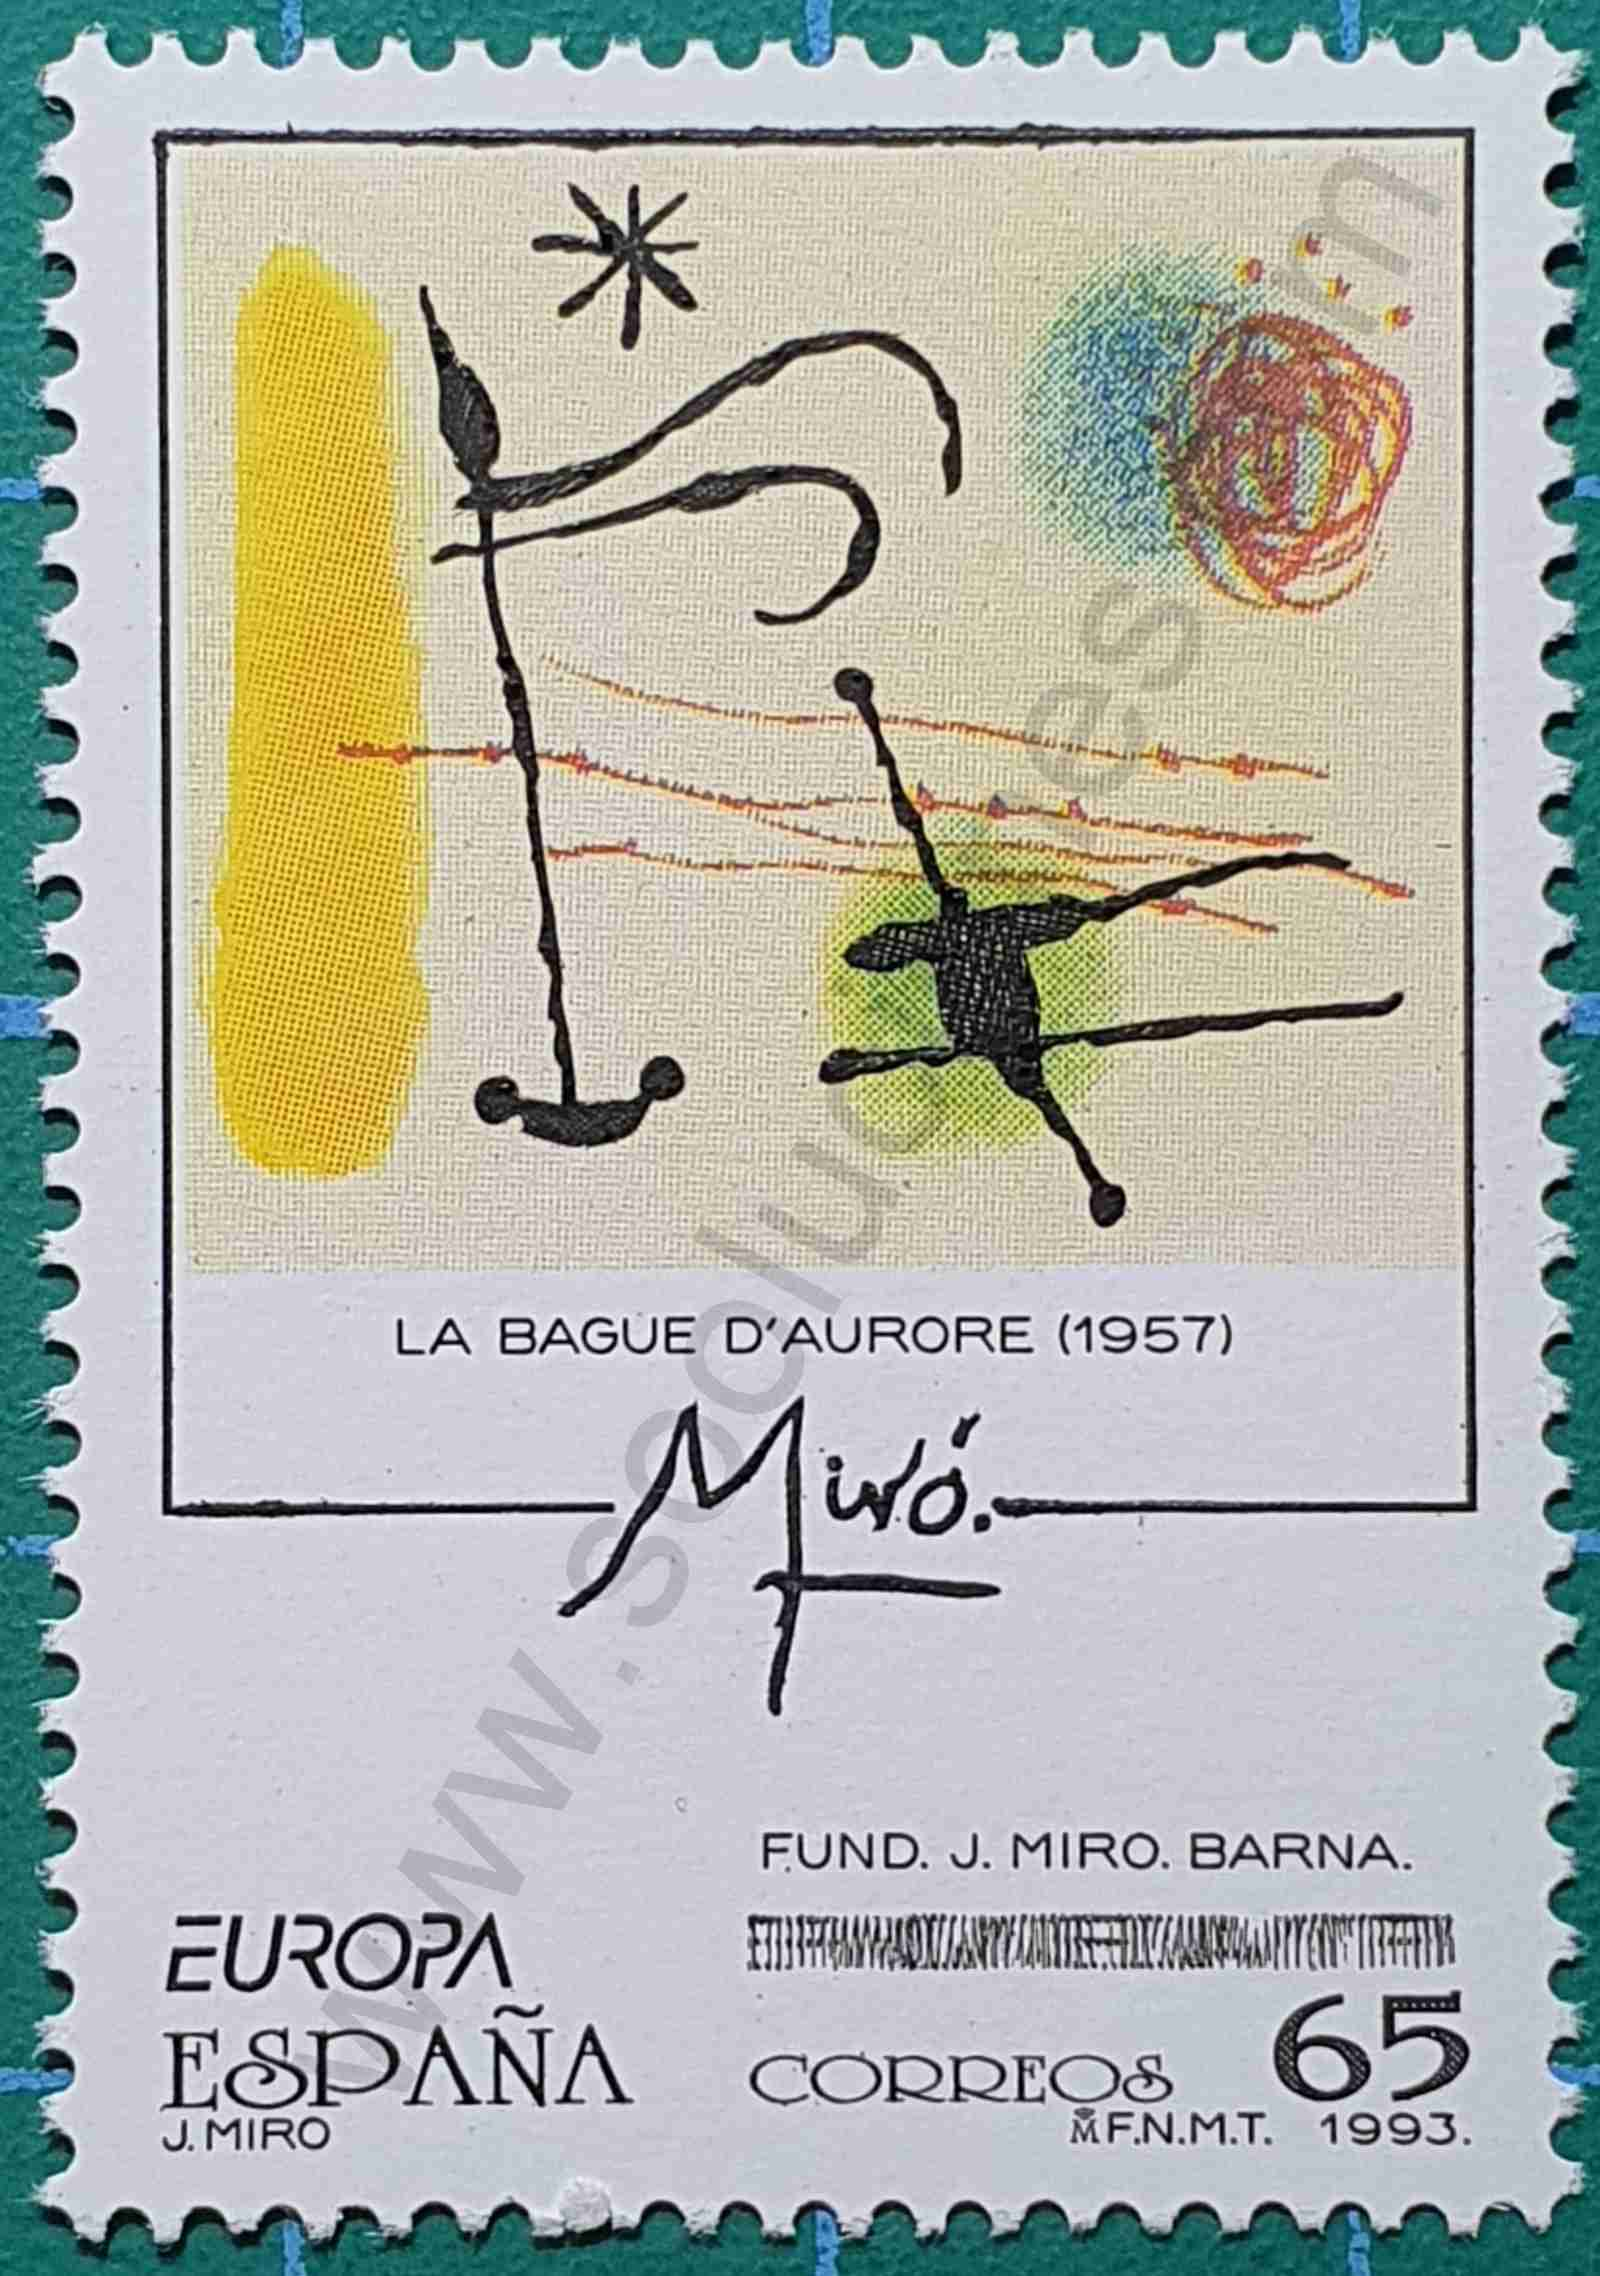 La Bague d'Aurore - Sello España 1993